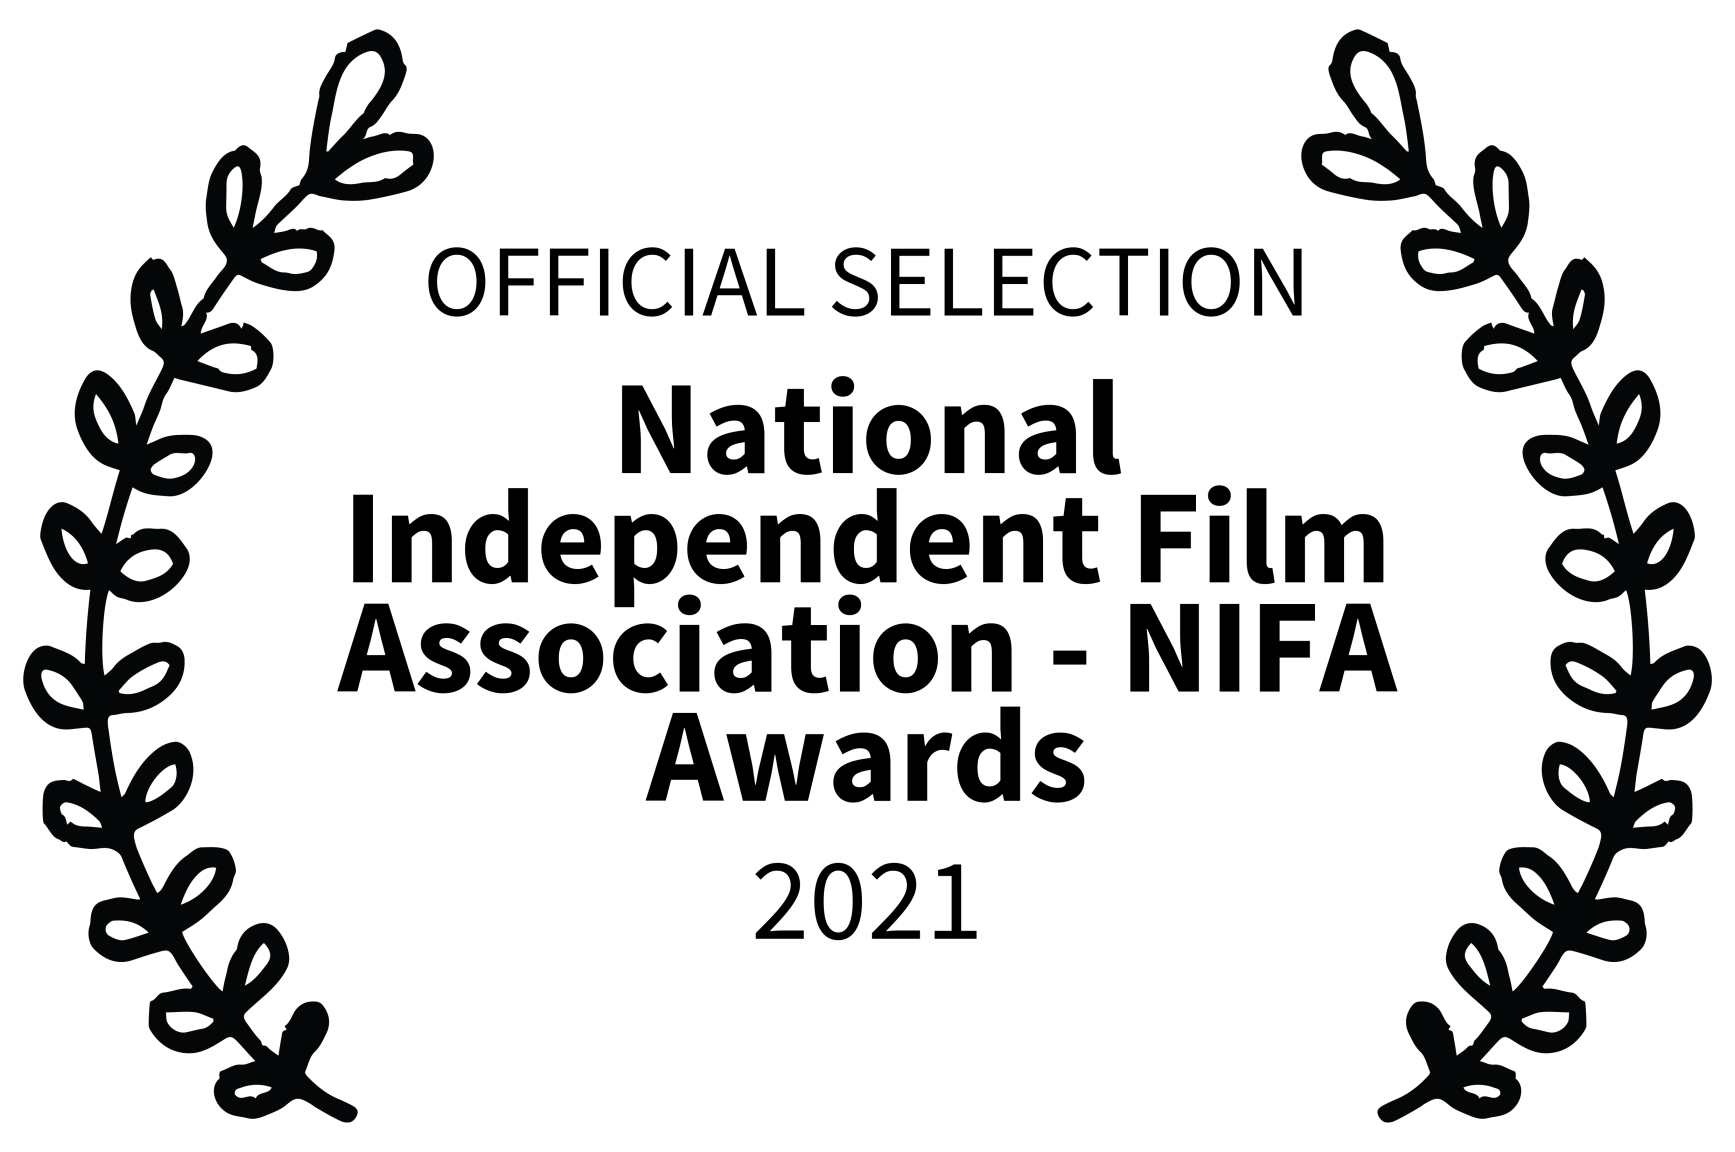 OFFICIAL-SELECTION---National-Independent-Film-Association---NIFA-Awards---2021